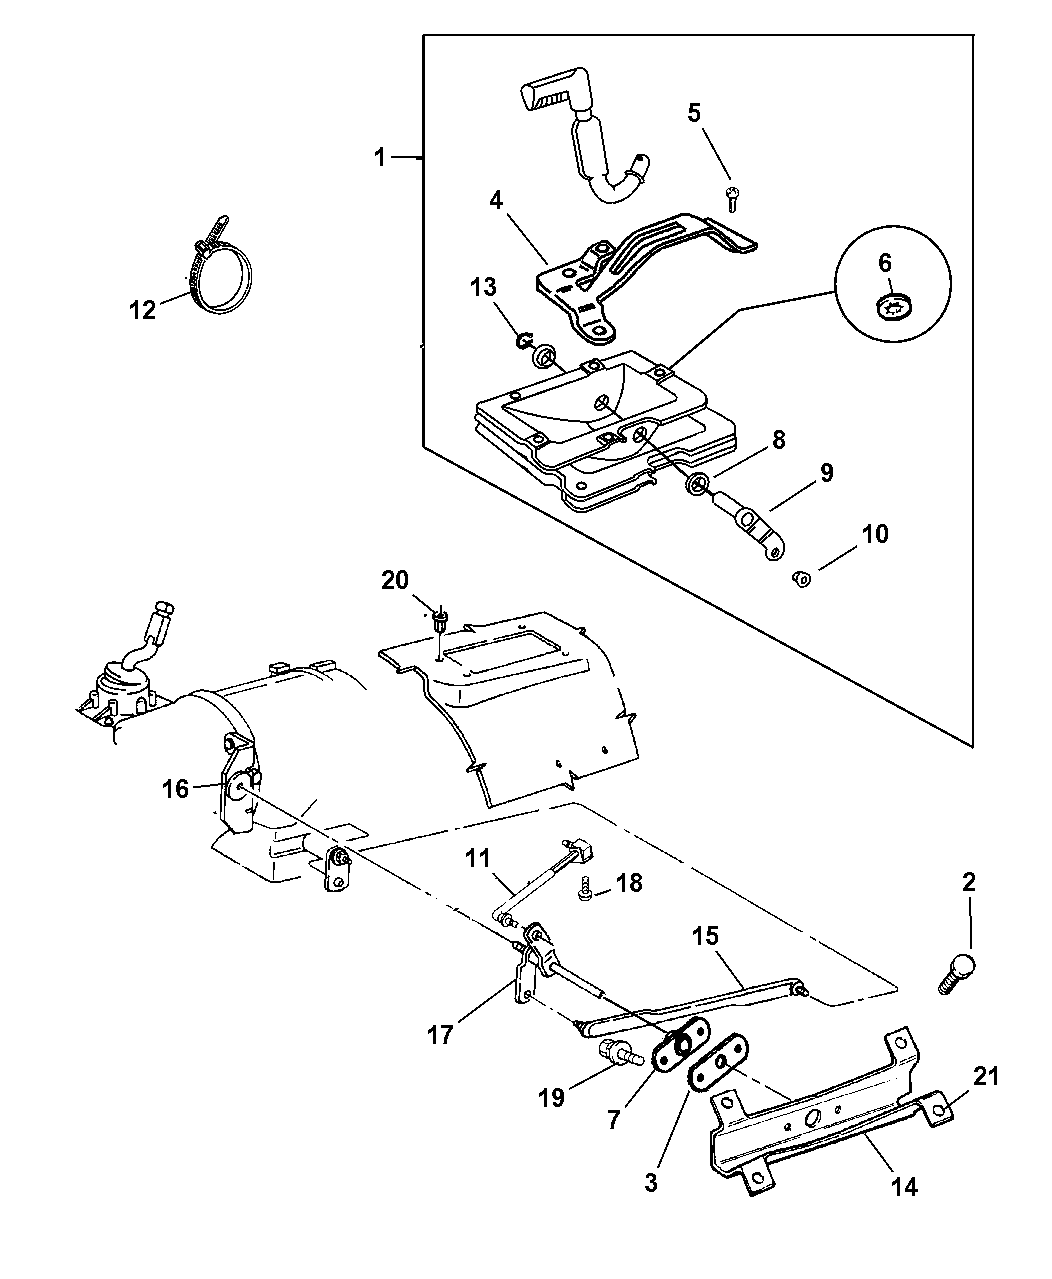 1999 Jeep Wrangler Gearshift Controls of Transfer Case Model